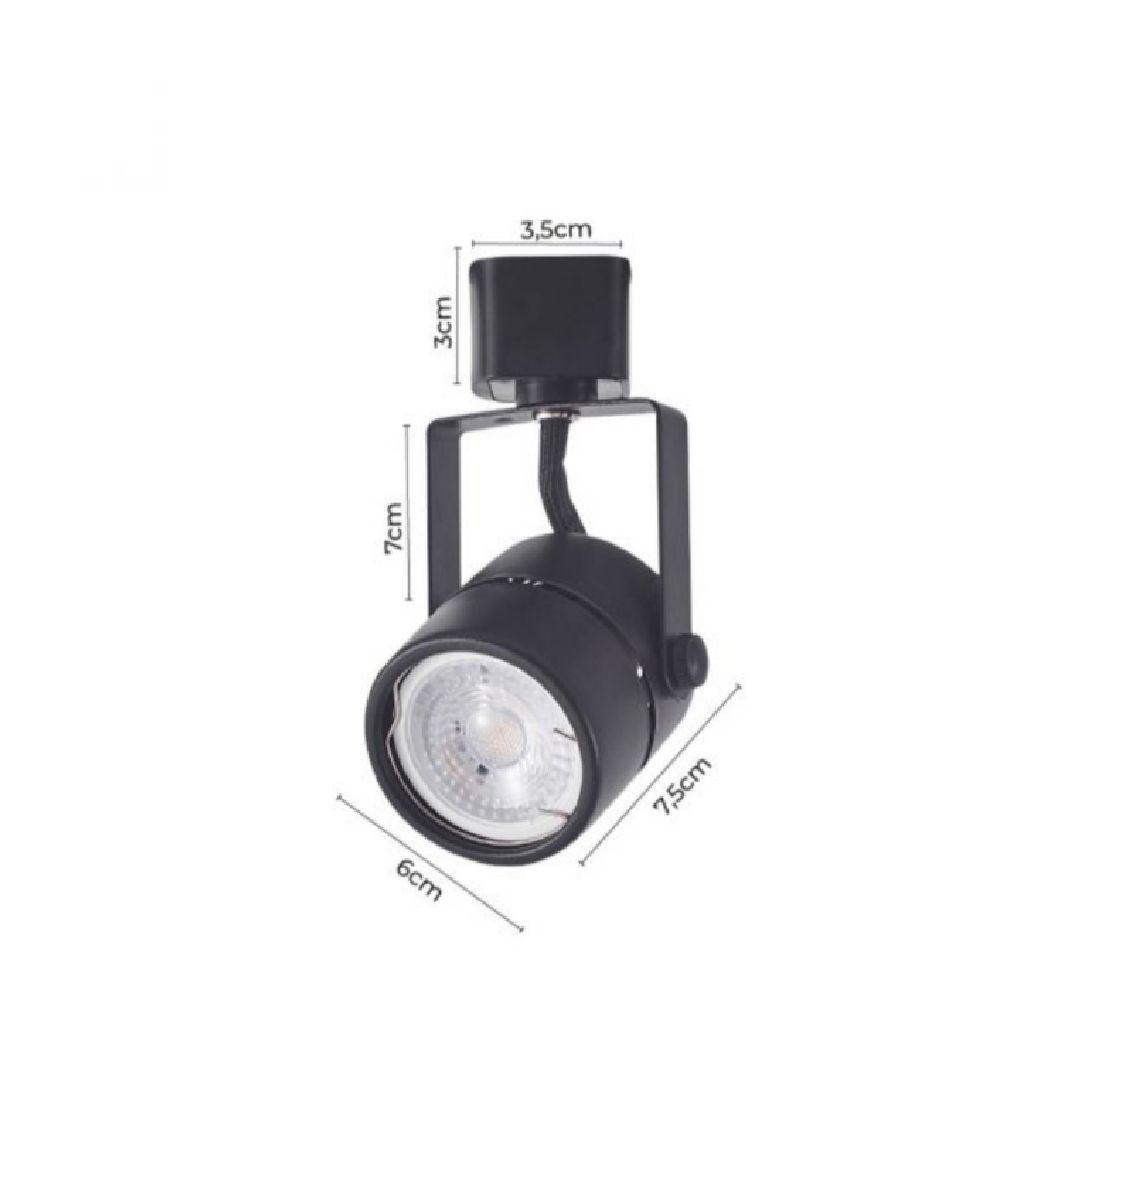 Kit Trilho Eletrificado 2m Preto Nordecor + 4 Spot Redondo MR16 / GU10 + Lâmp. Led Luz Quente